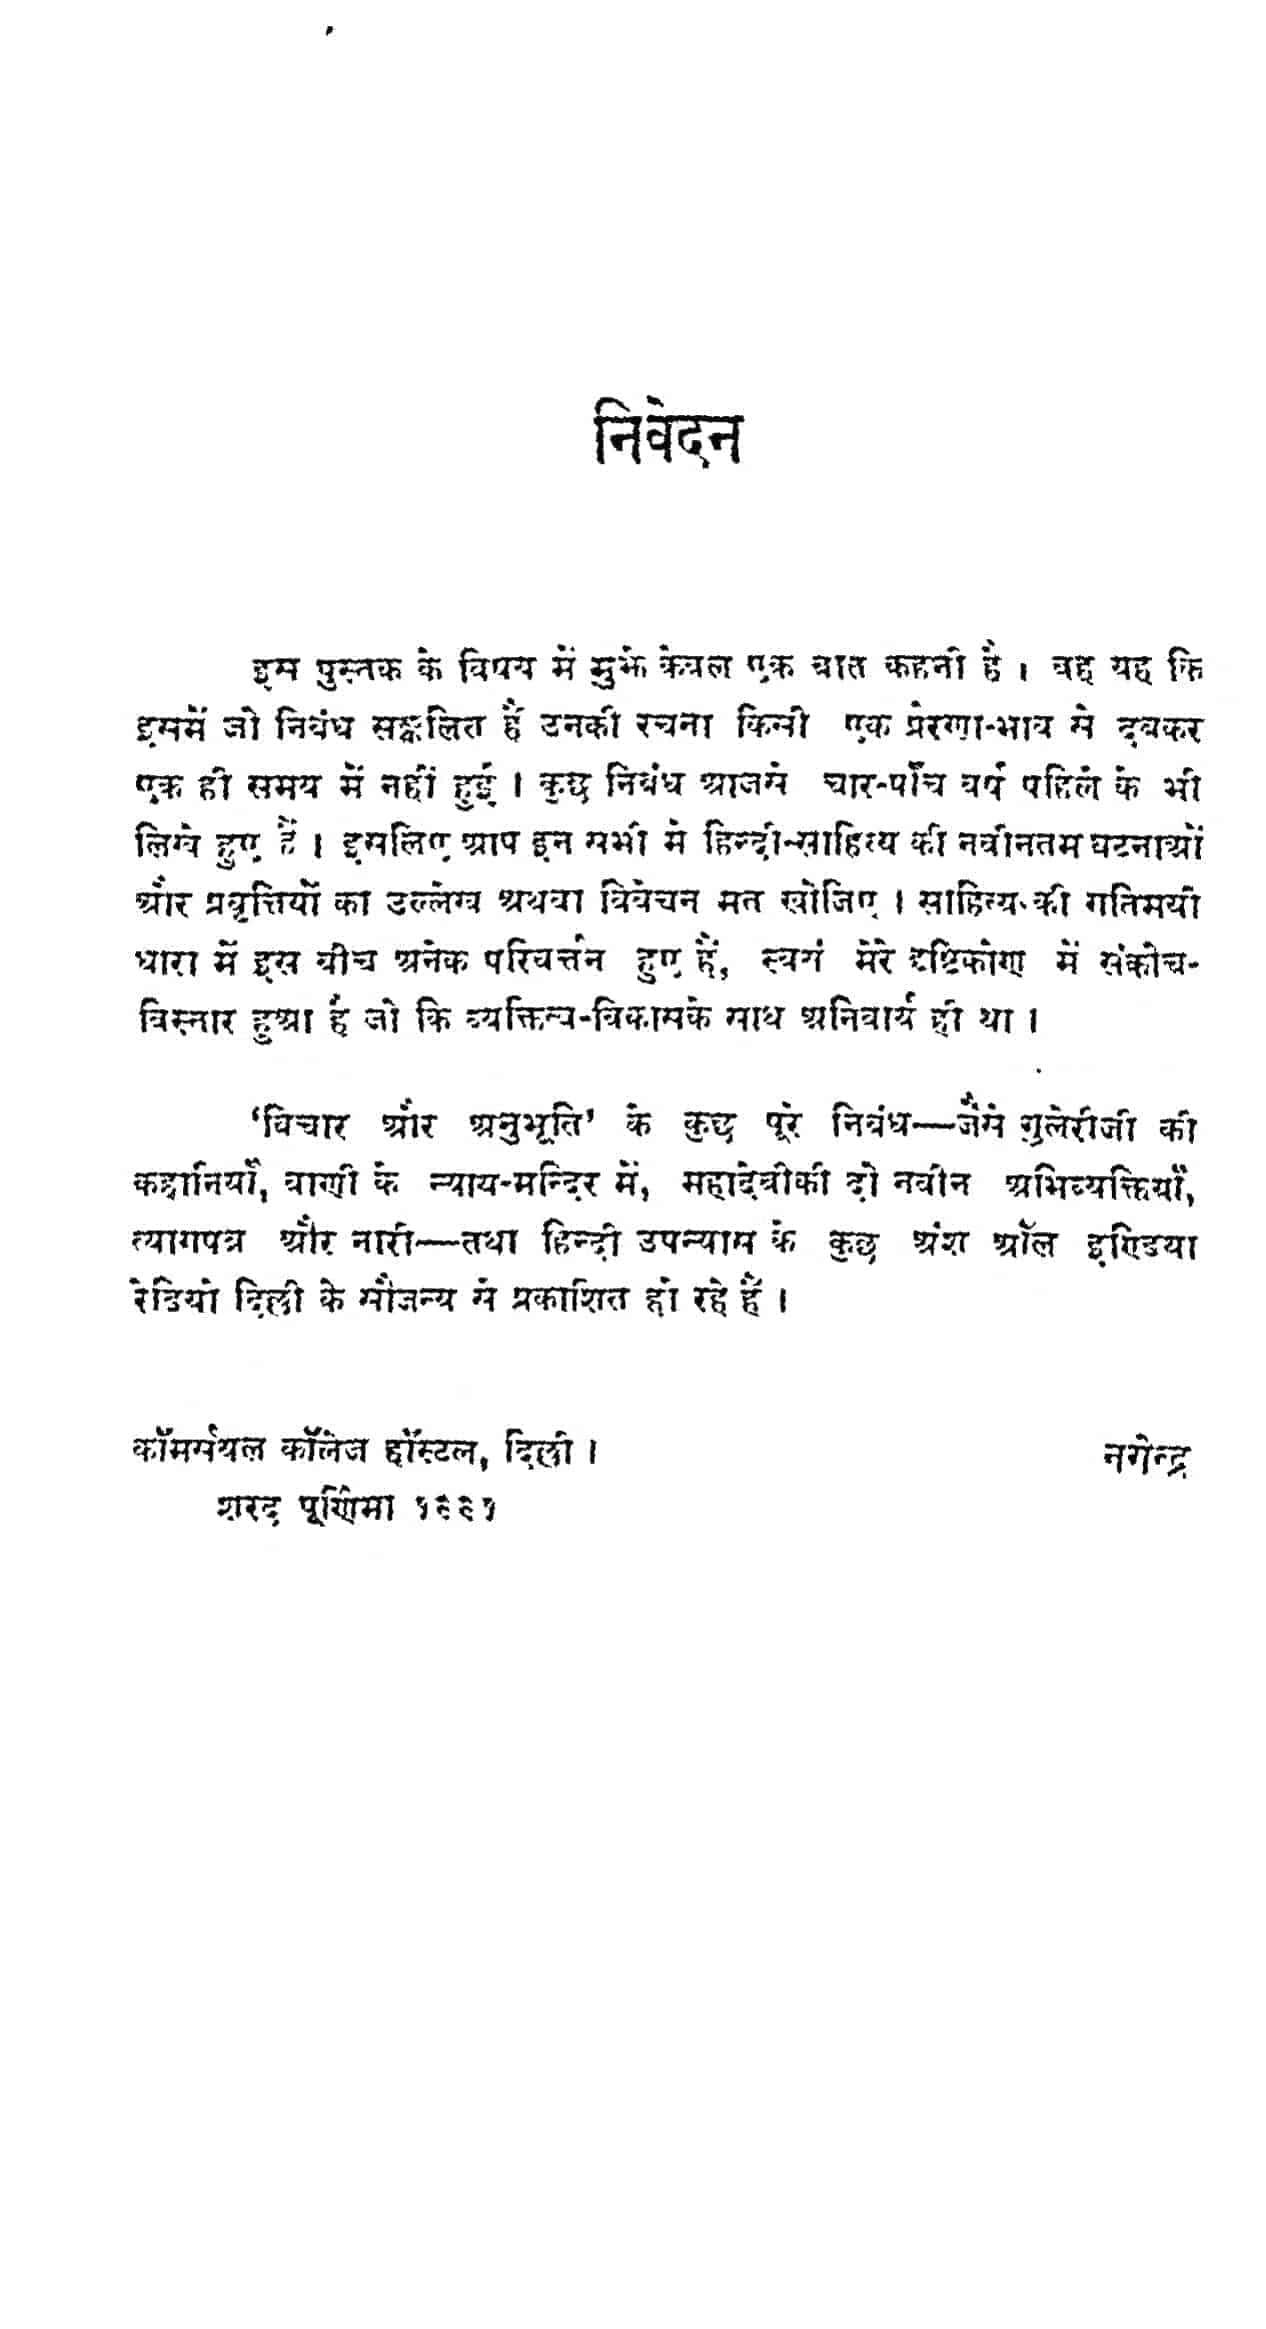 Book Image : विचार और अनुभूति - Vichar Aur Anubhuti